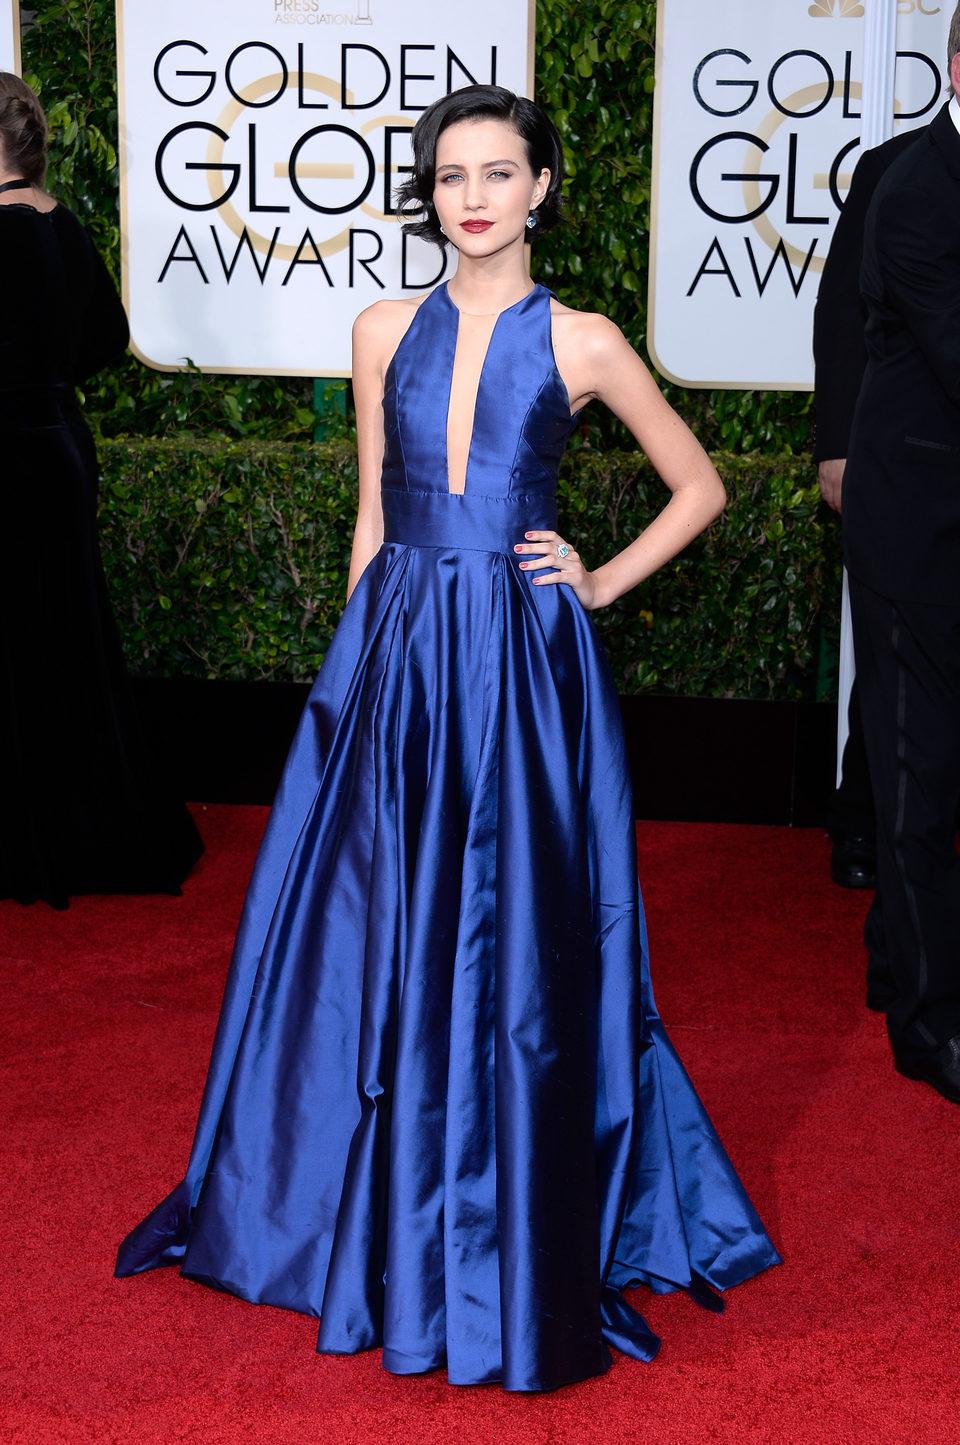 Julia Goldani Telles en la alfombra roja de los Globos de Oro 2015